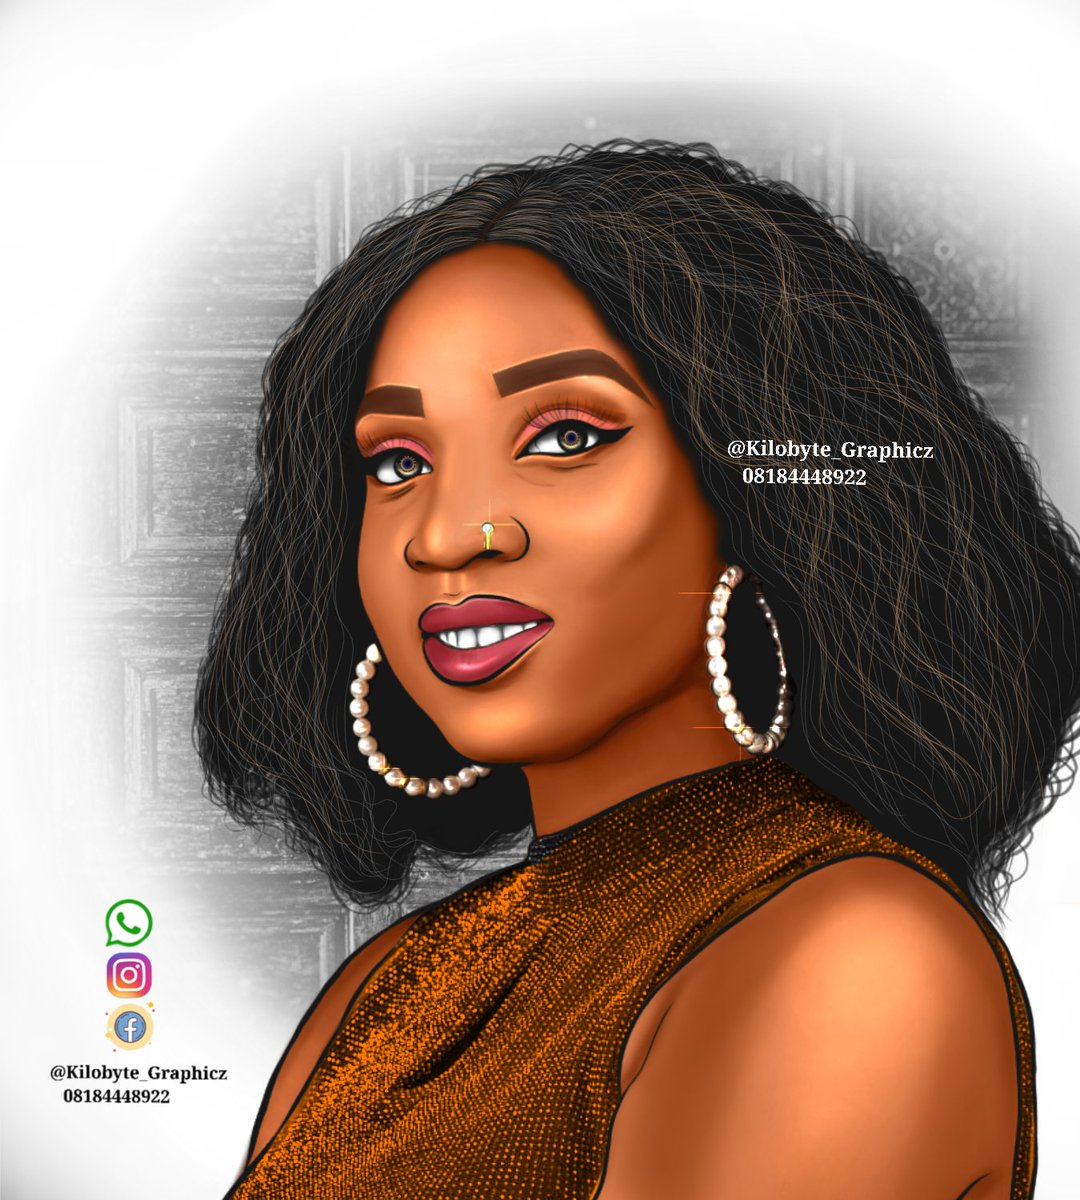 This is what we do best...digital art and framing...@KILOBYT91359140 @QueenGiftee @TONTOLET @CartoonArtDxb @ARTIS #digital #3dart #artist #art #artwork #design #drawing #frame #digitalart #illustration #artistsontwitter #FanArtFriday #drawingwhileblack